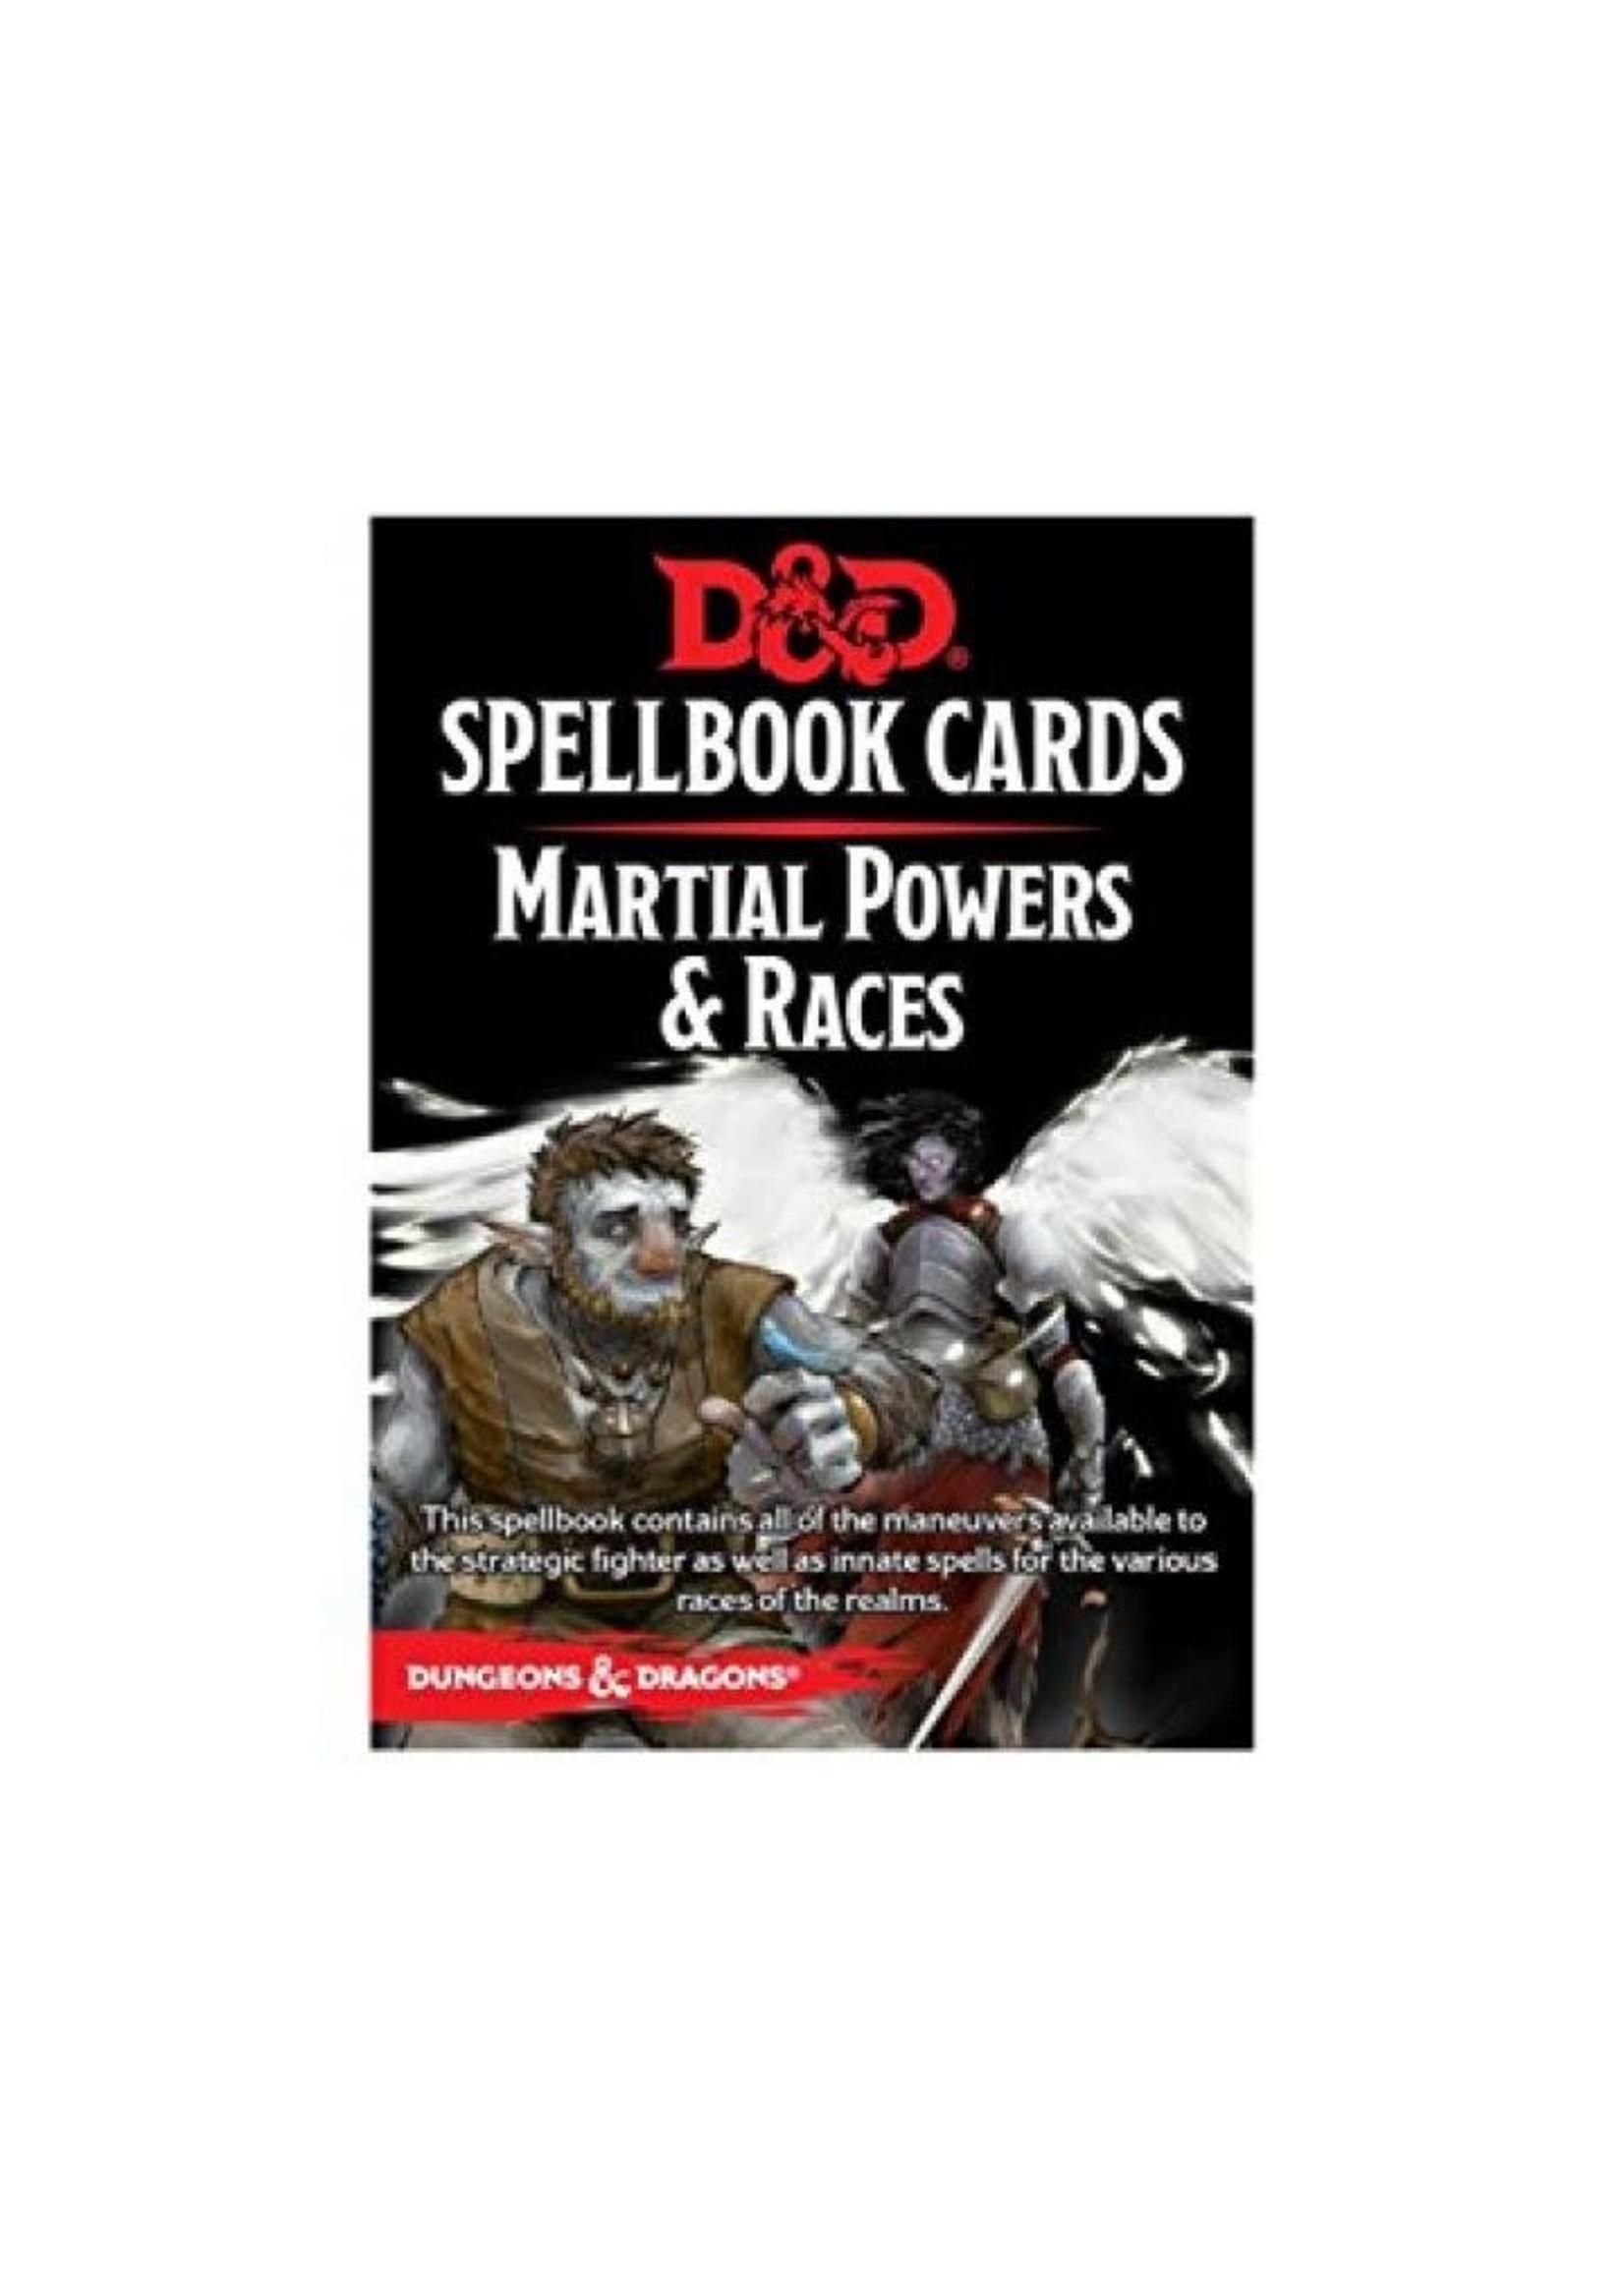 D&D Spellbook Cards Martial Powers & Races